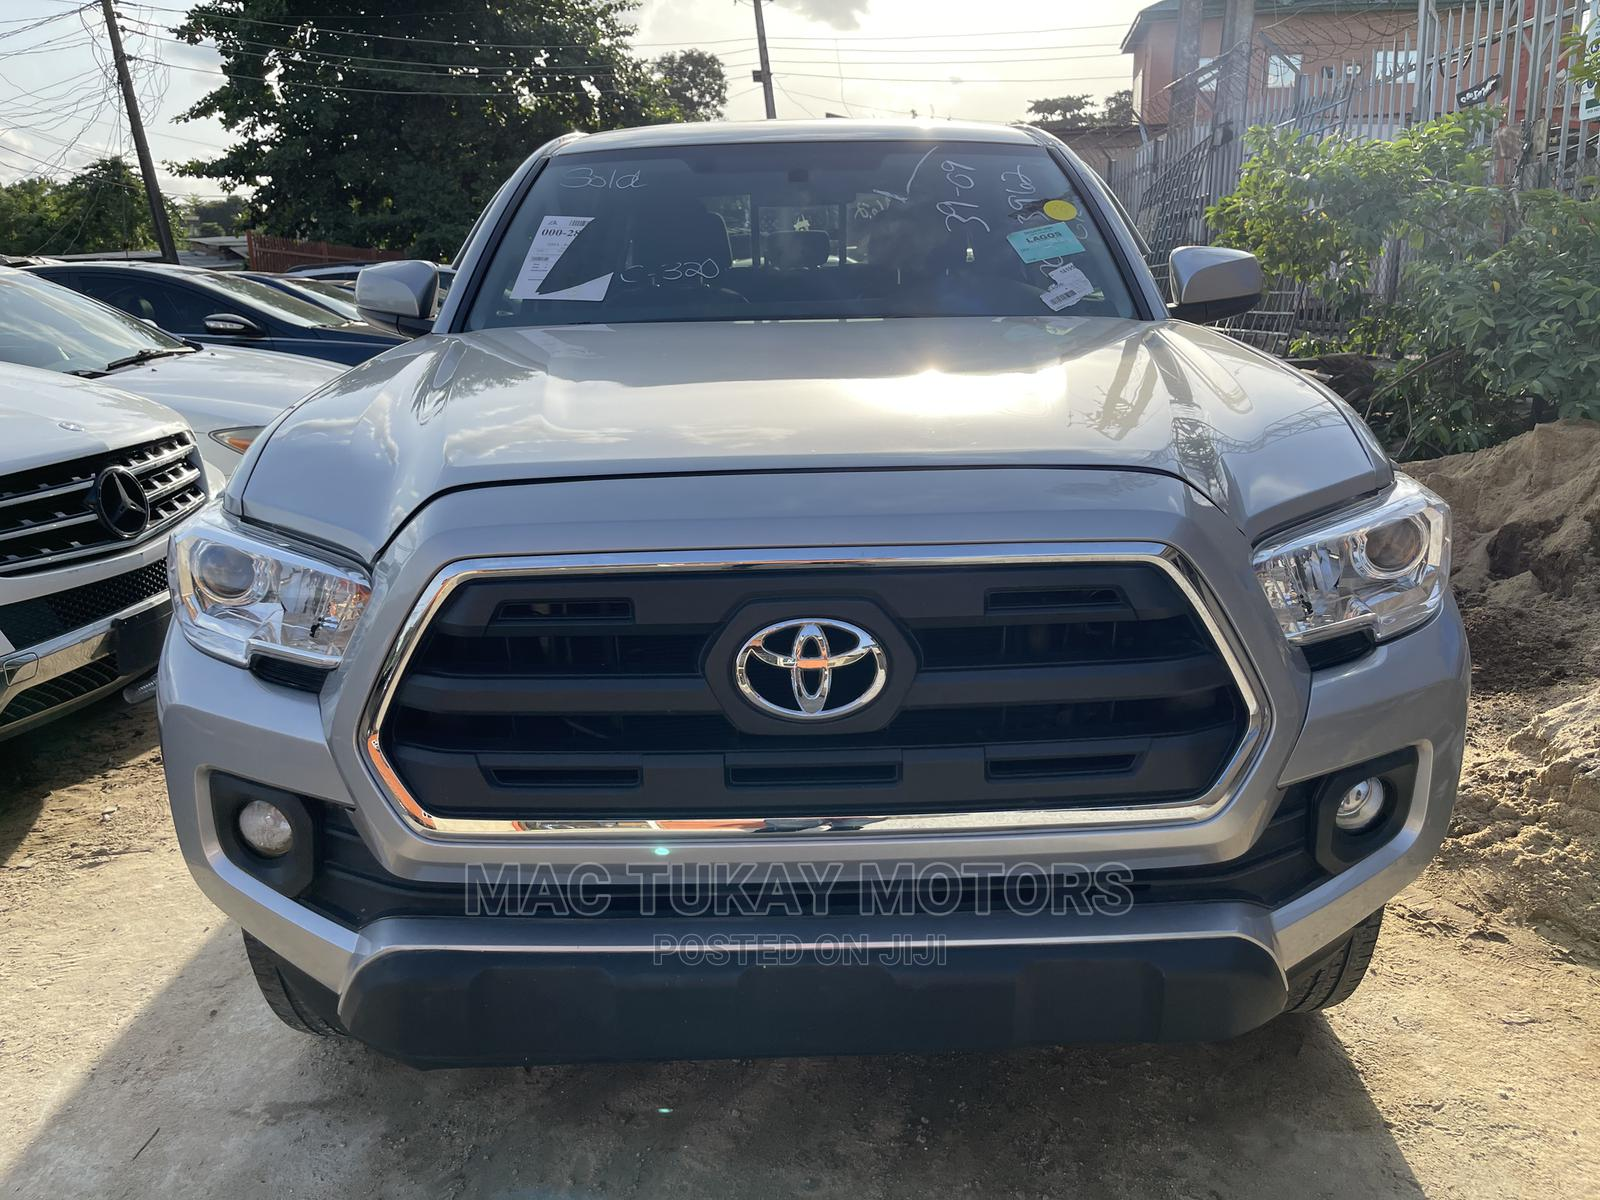 Toyota Tacoma 2016 4dr Double Cab Gray